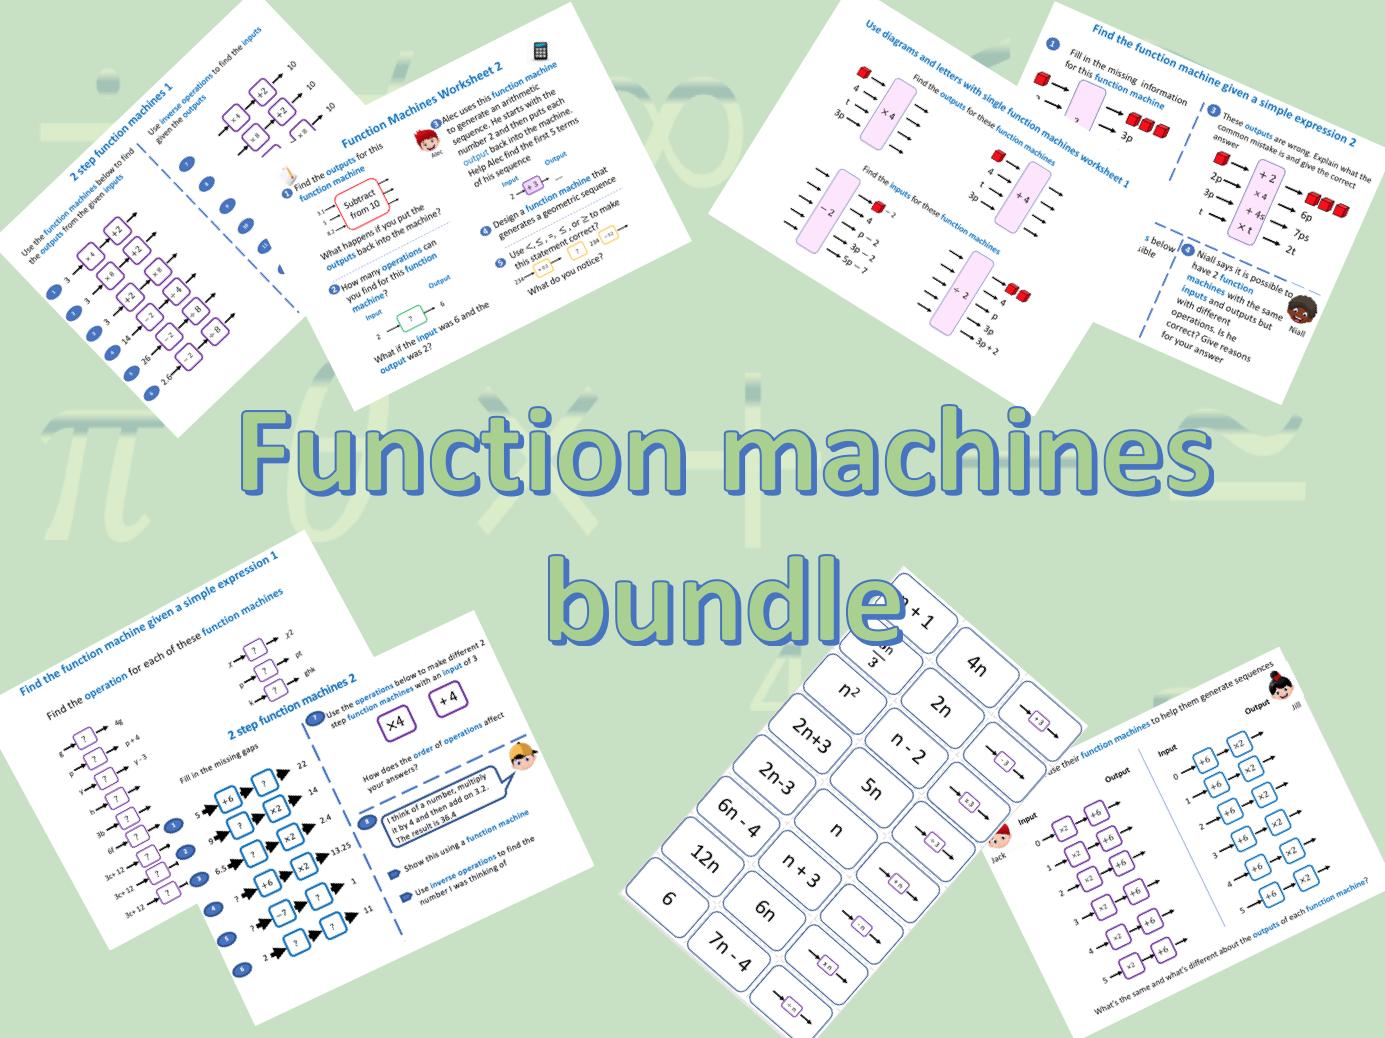 Function Machines bundle